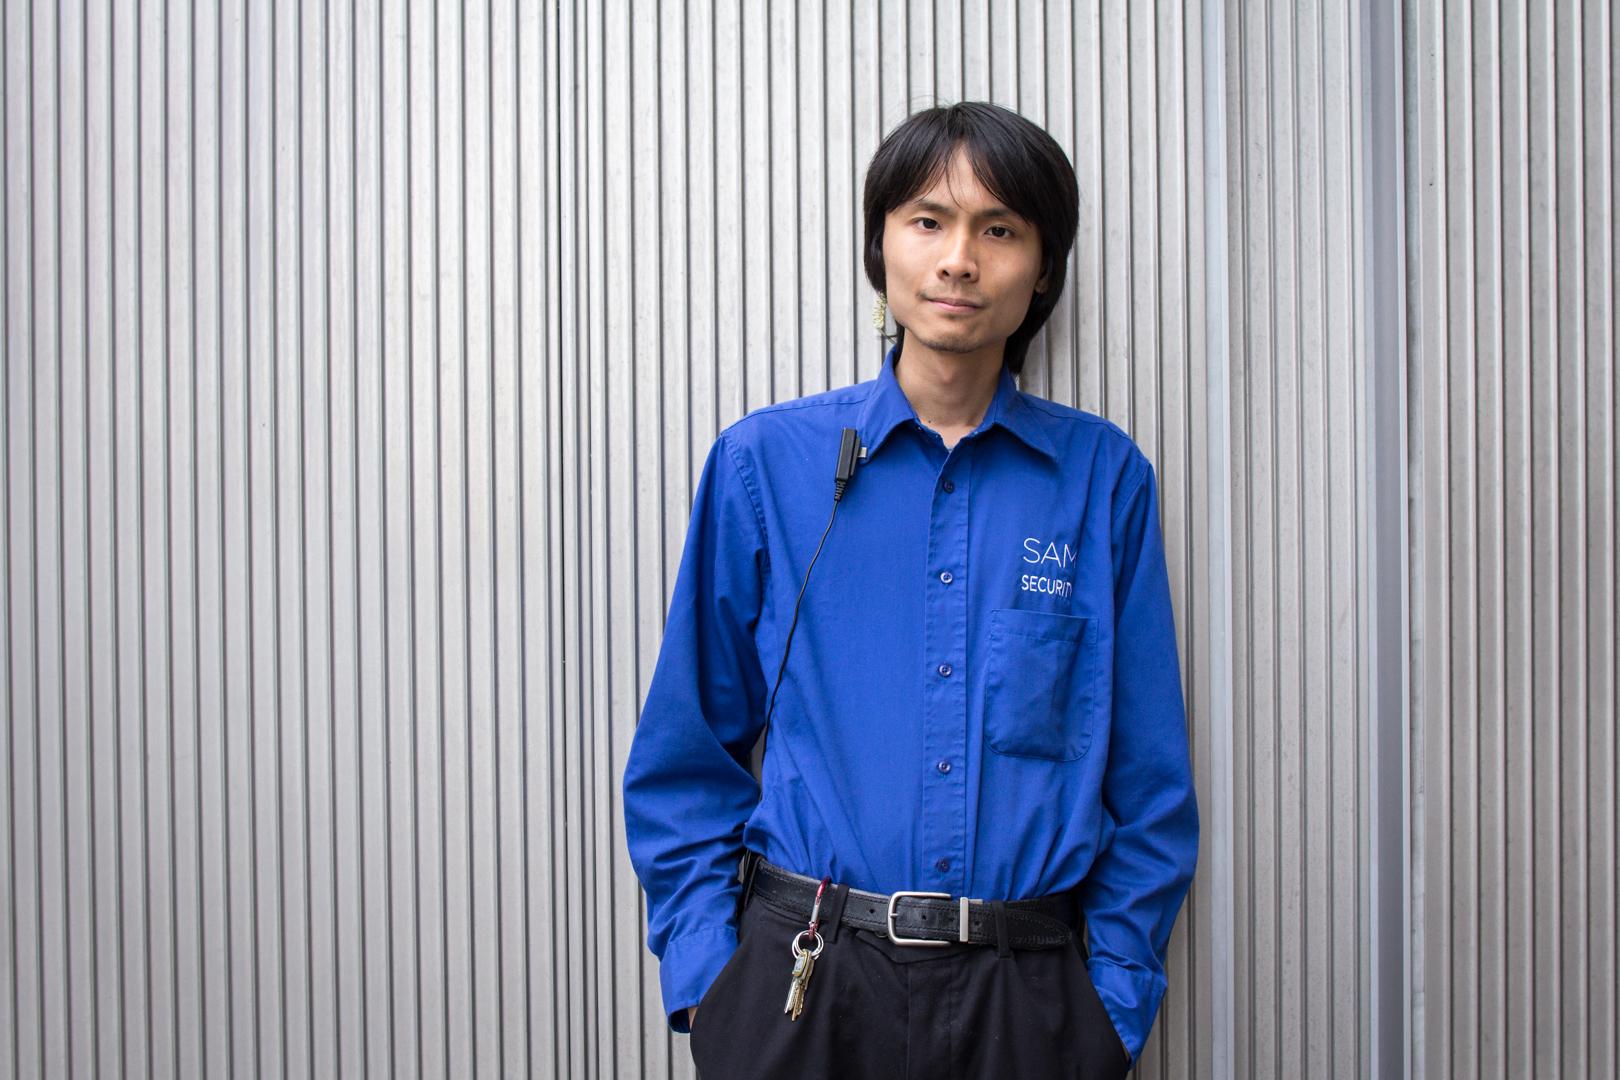 Get to Know SAM's VSOs: David Yamato